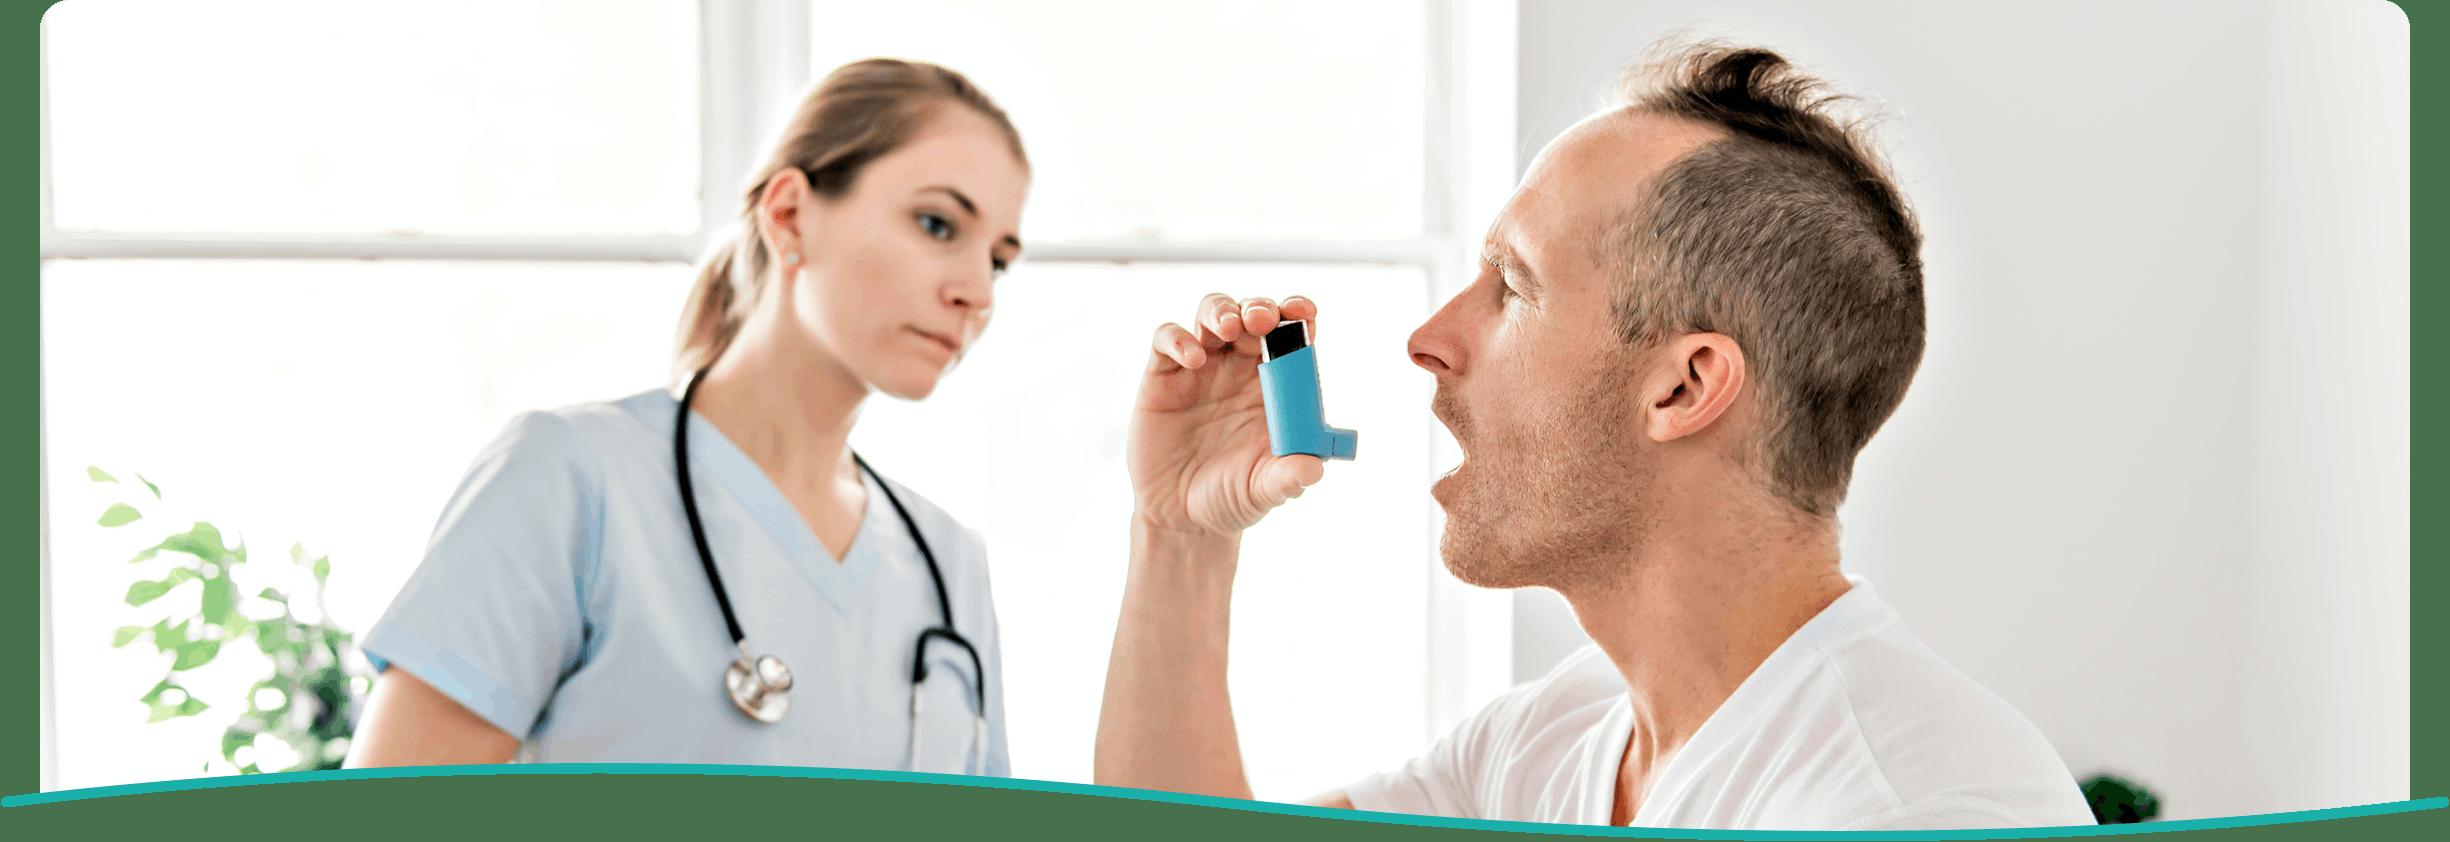 Banner: Doctor Giving Patient Inhaler